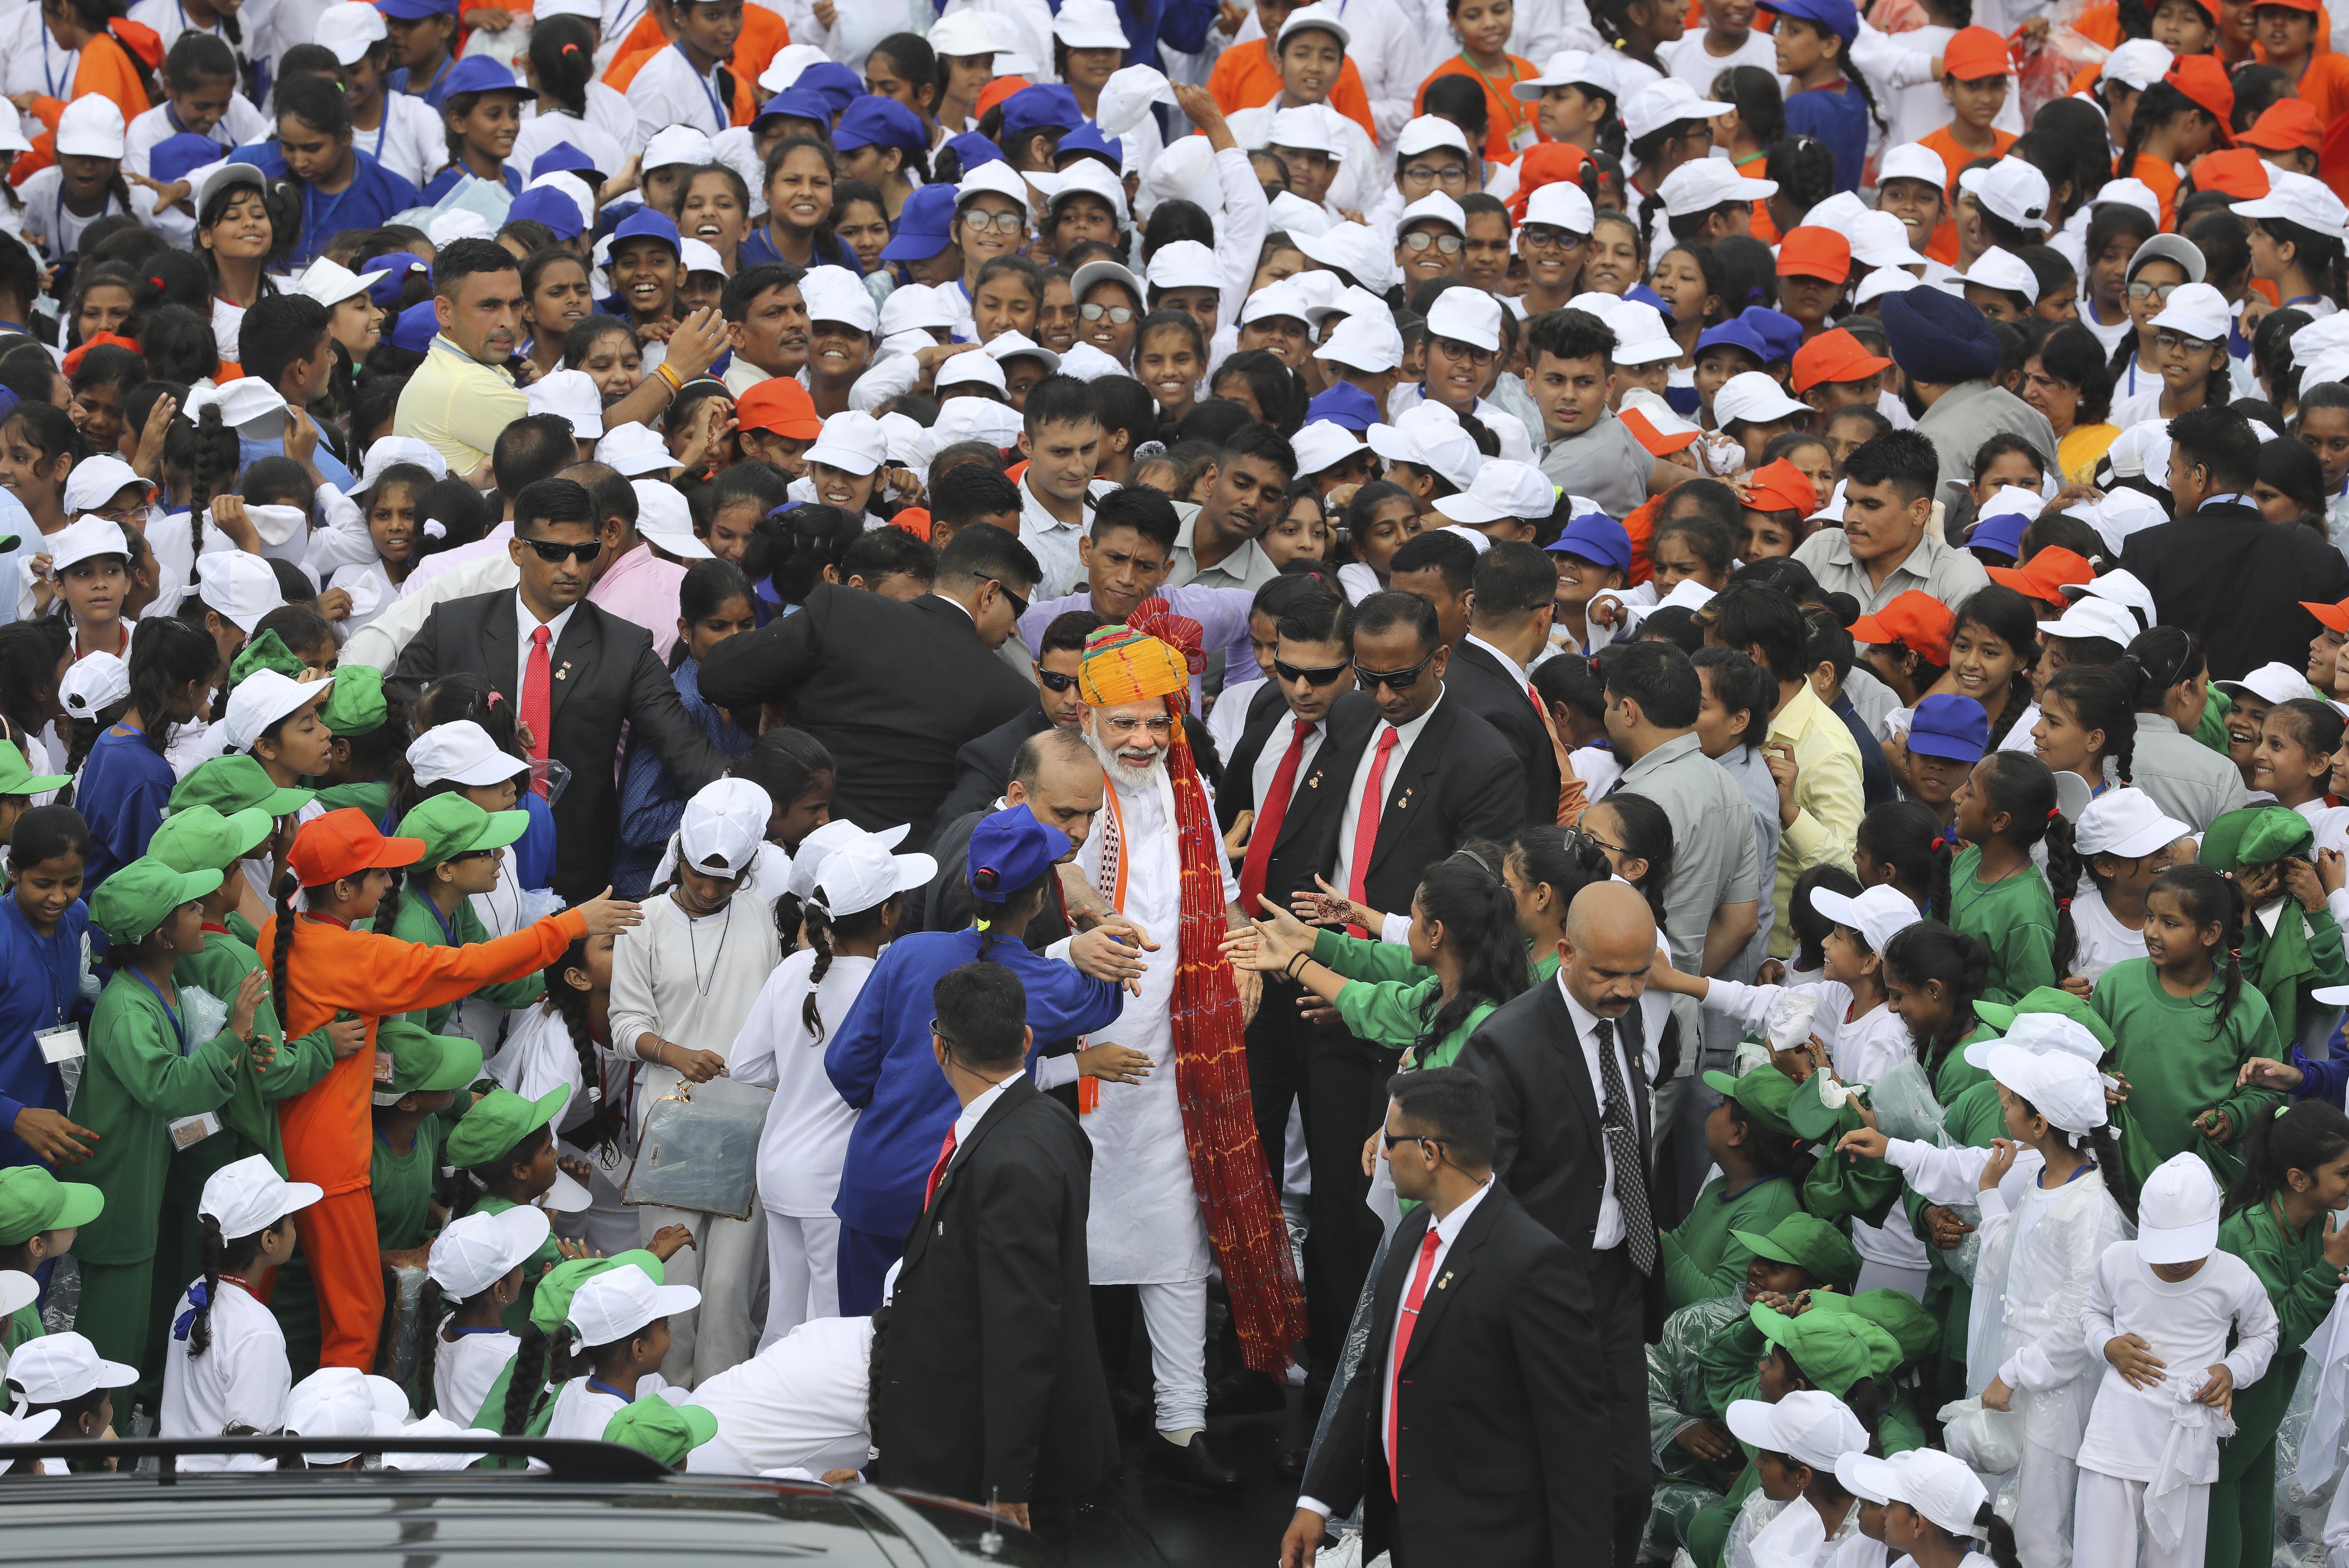 Prime Minister Narendra Modi greets school children in New Delhi on Independence Day